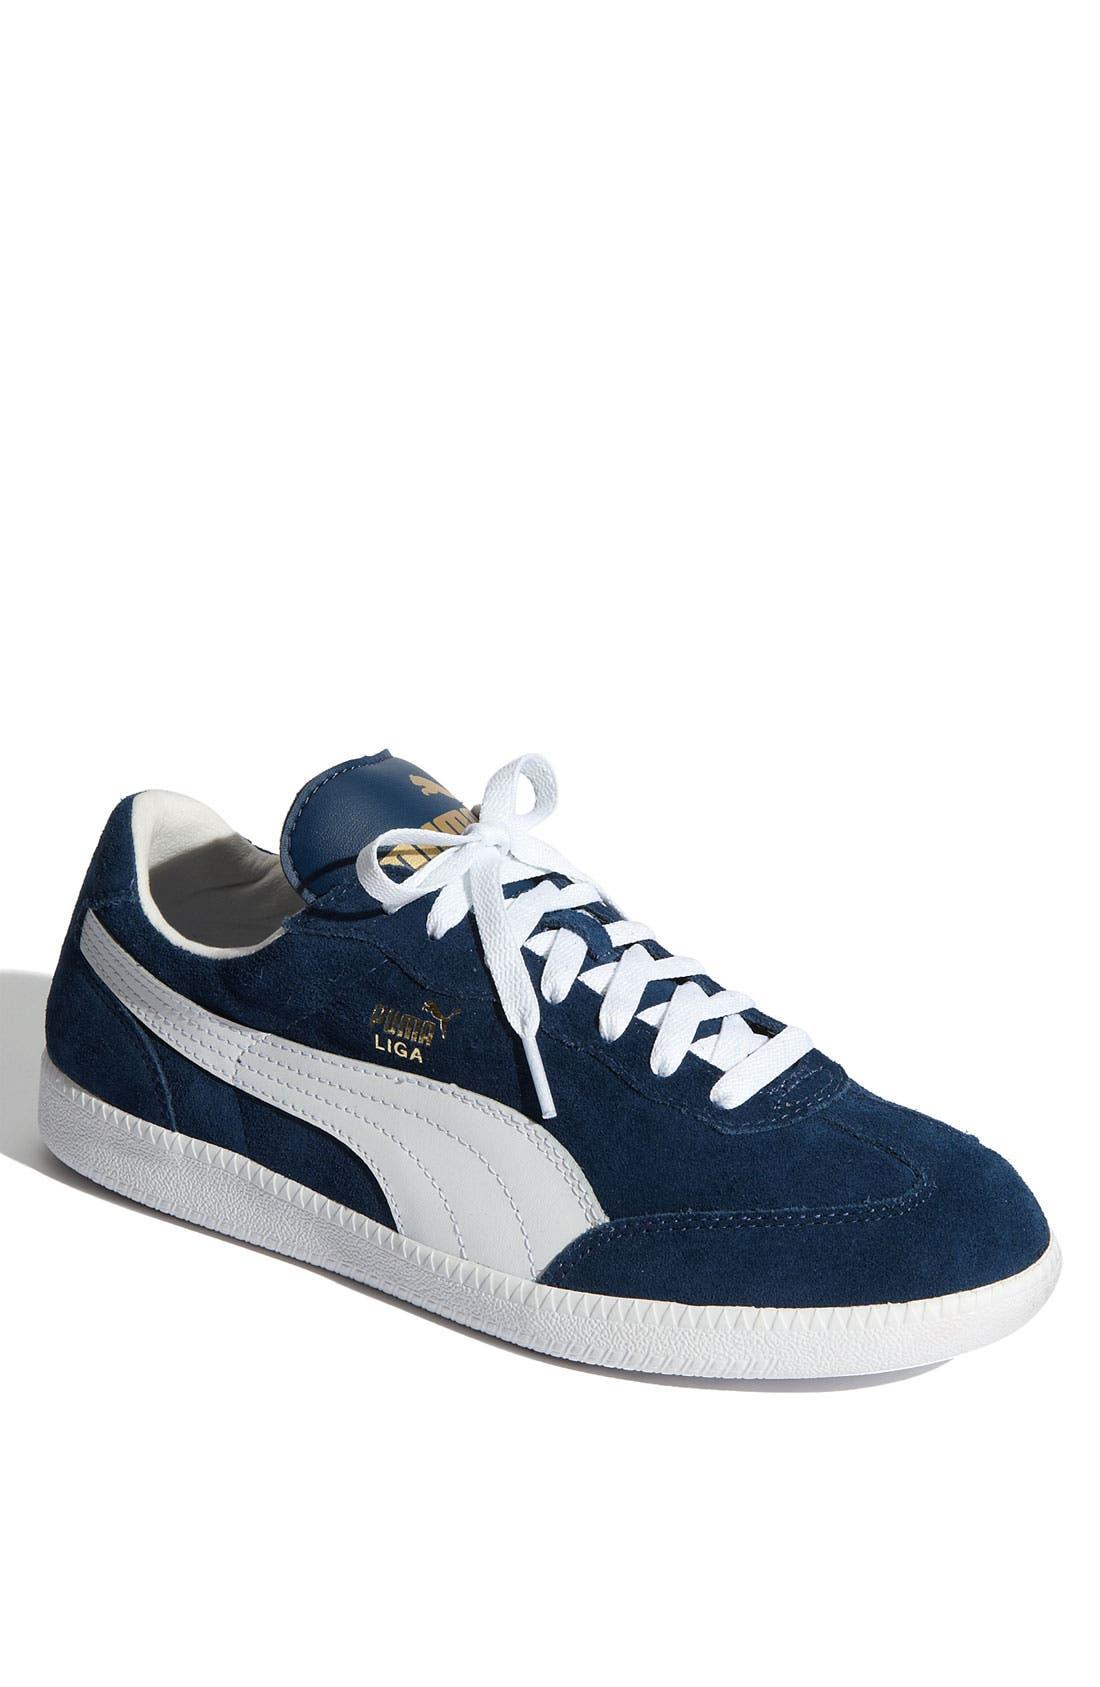 Main Image - Puma 'Liga Suede II' Sneaker (Online Exclusive)